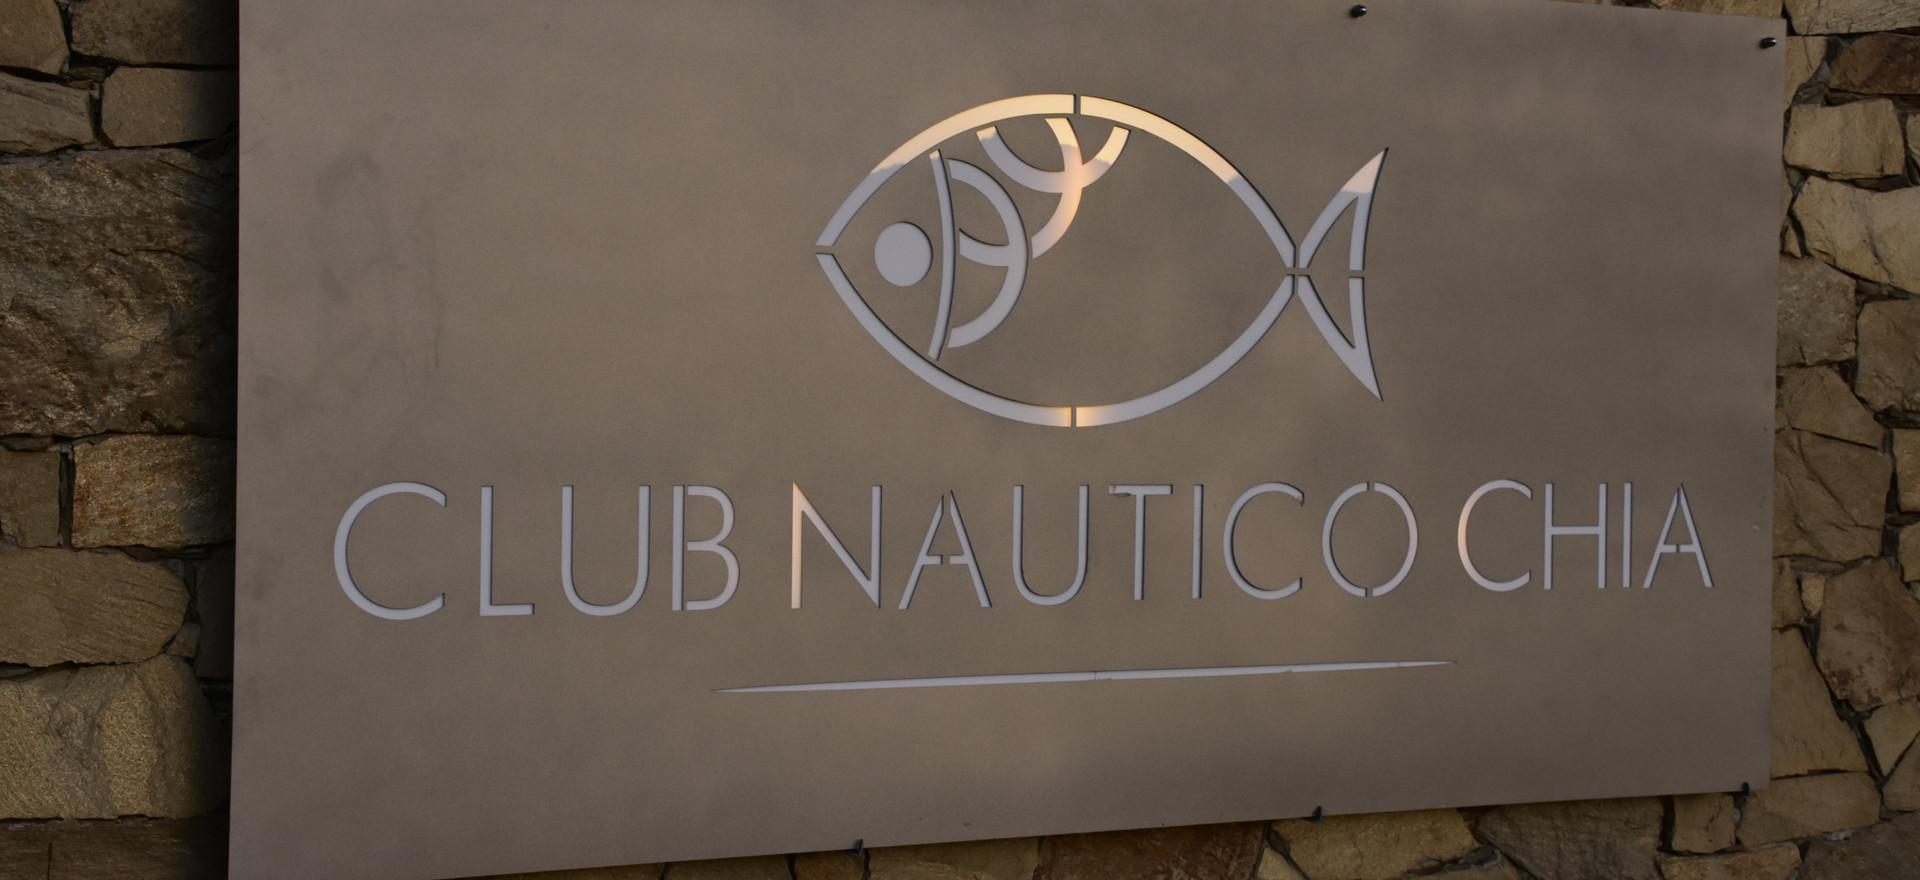 ristorante   club nautico chia